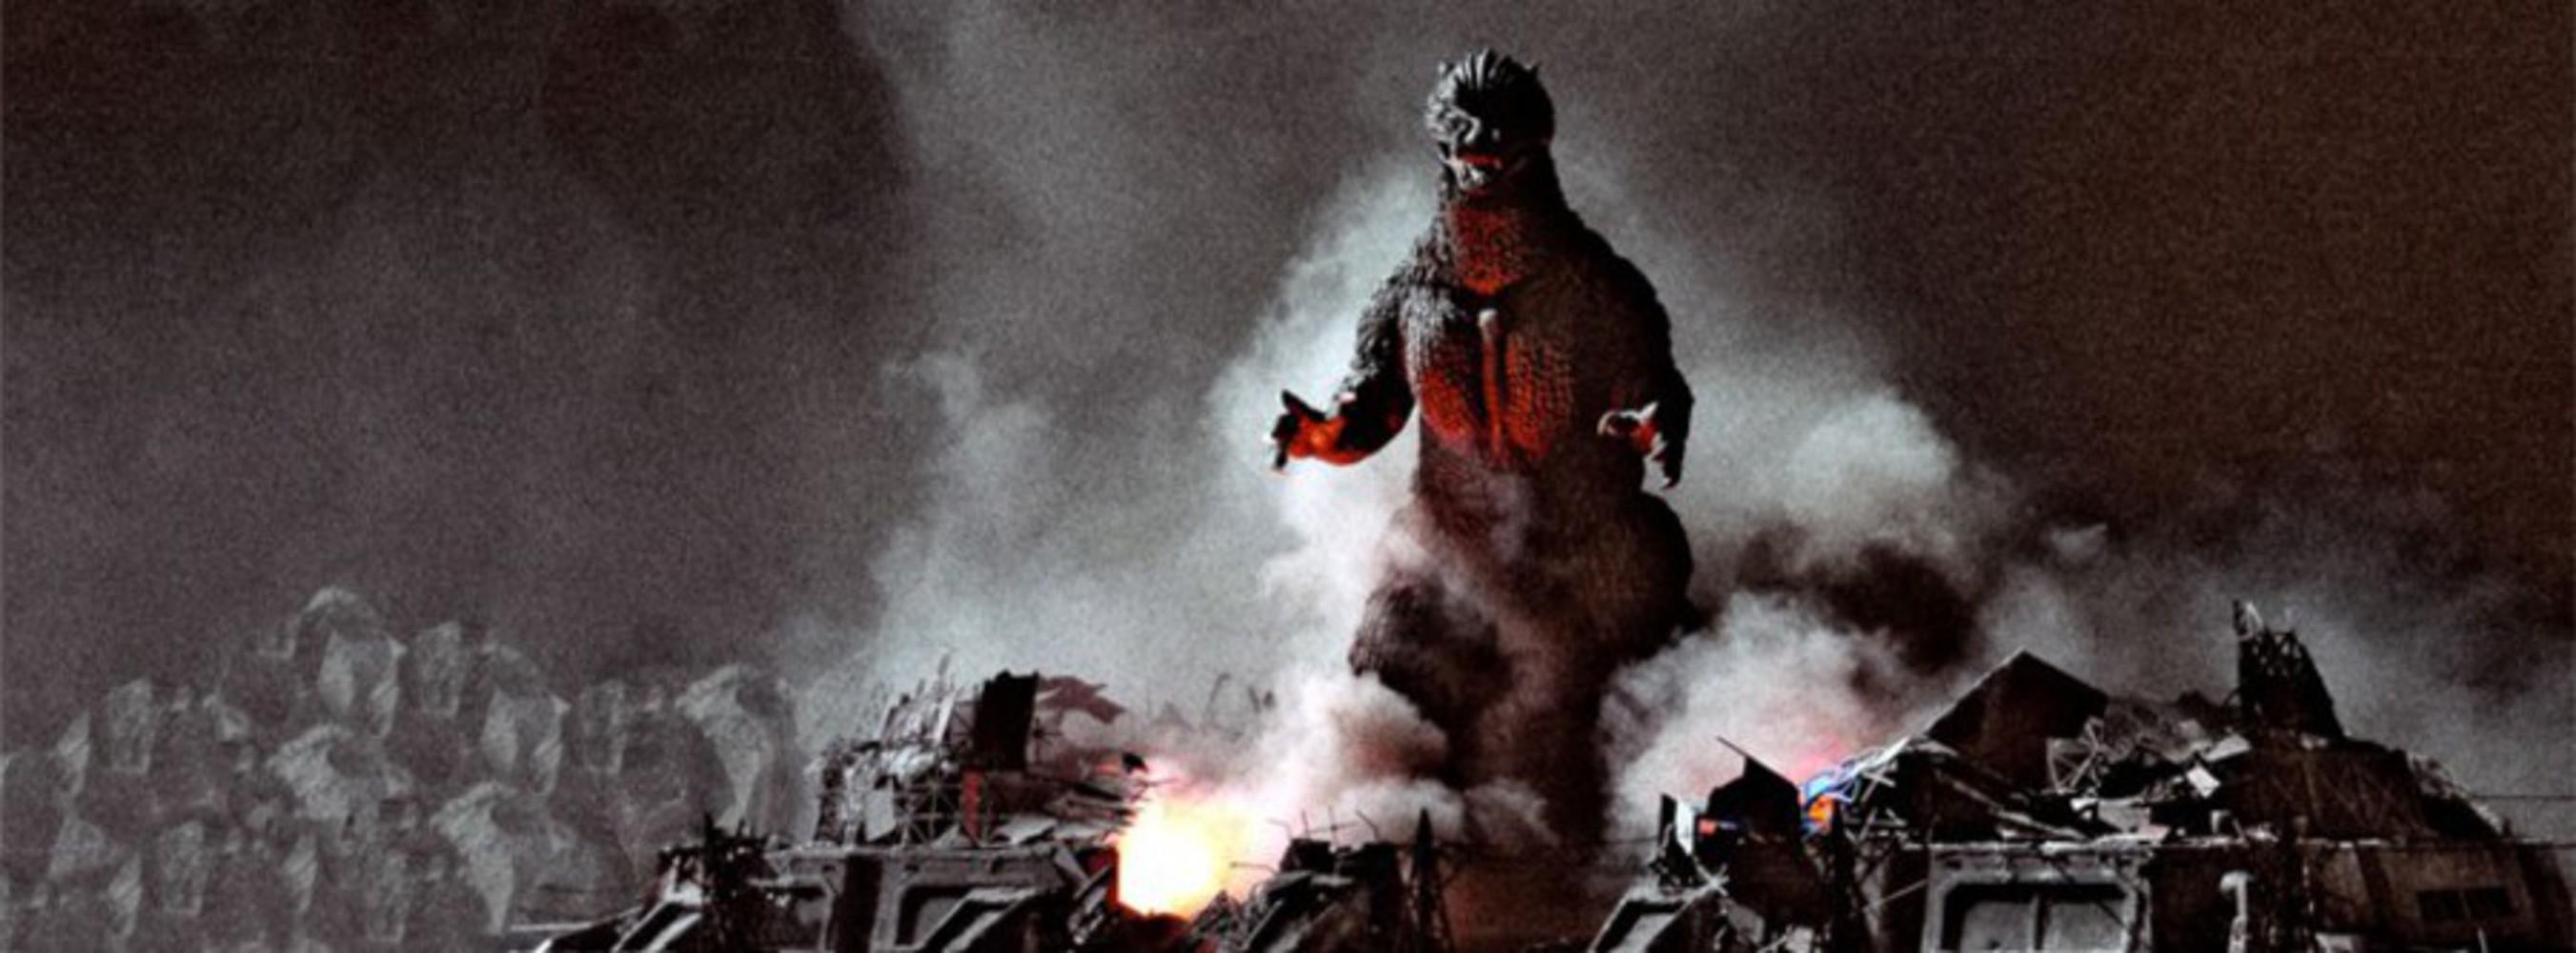 Godzilla.thumb